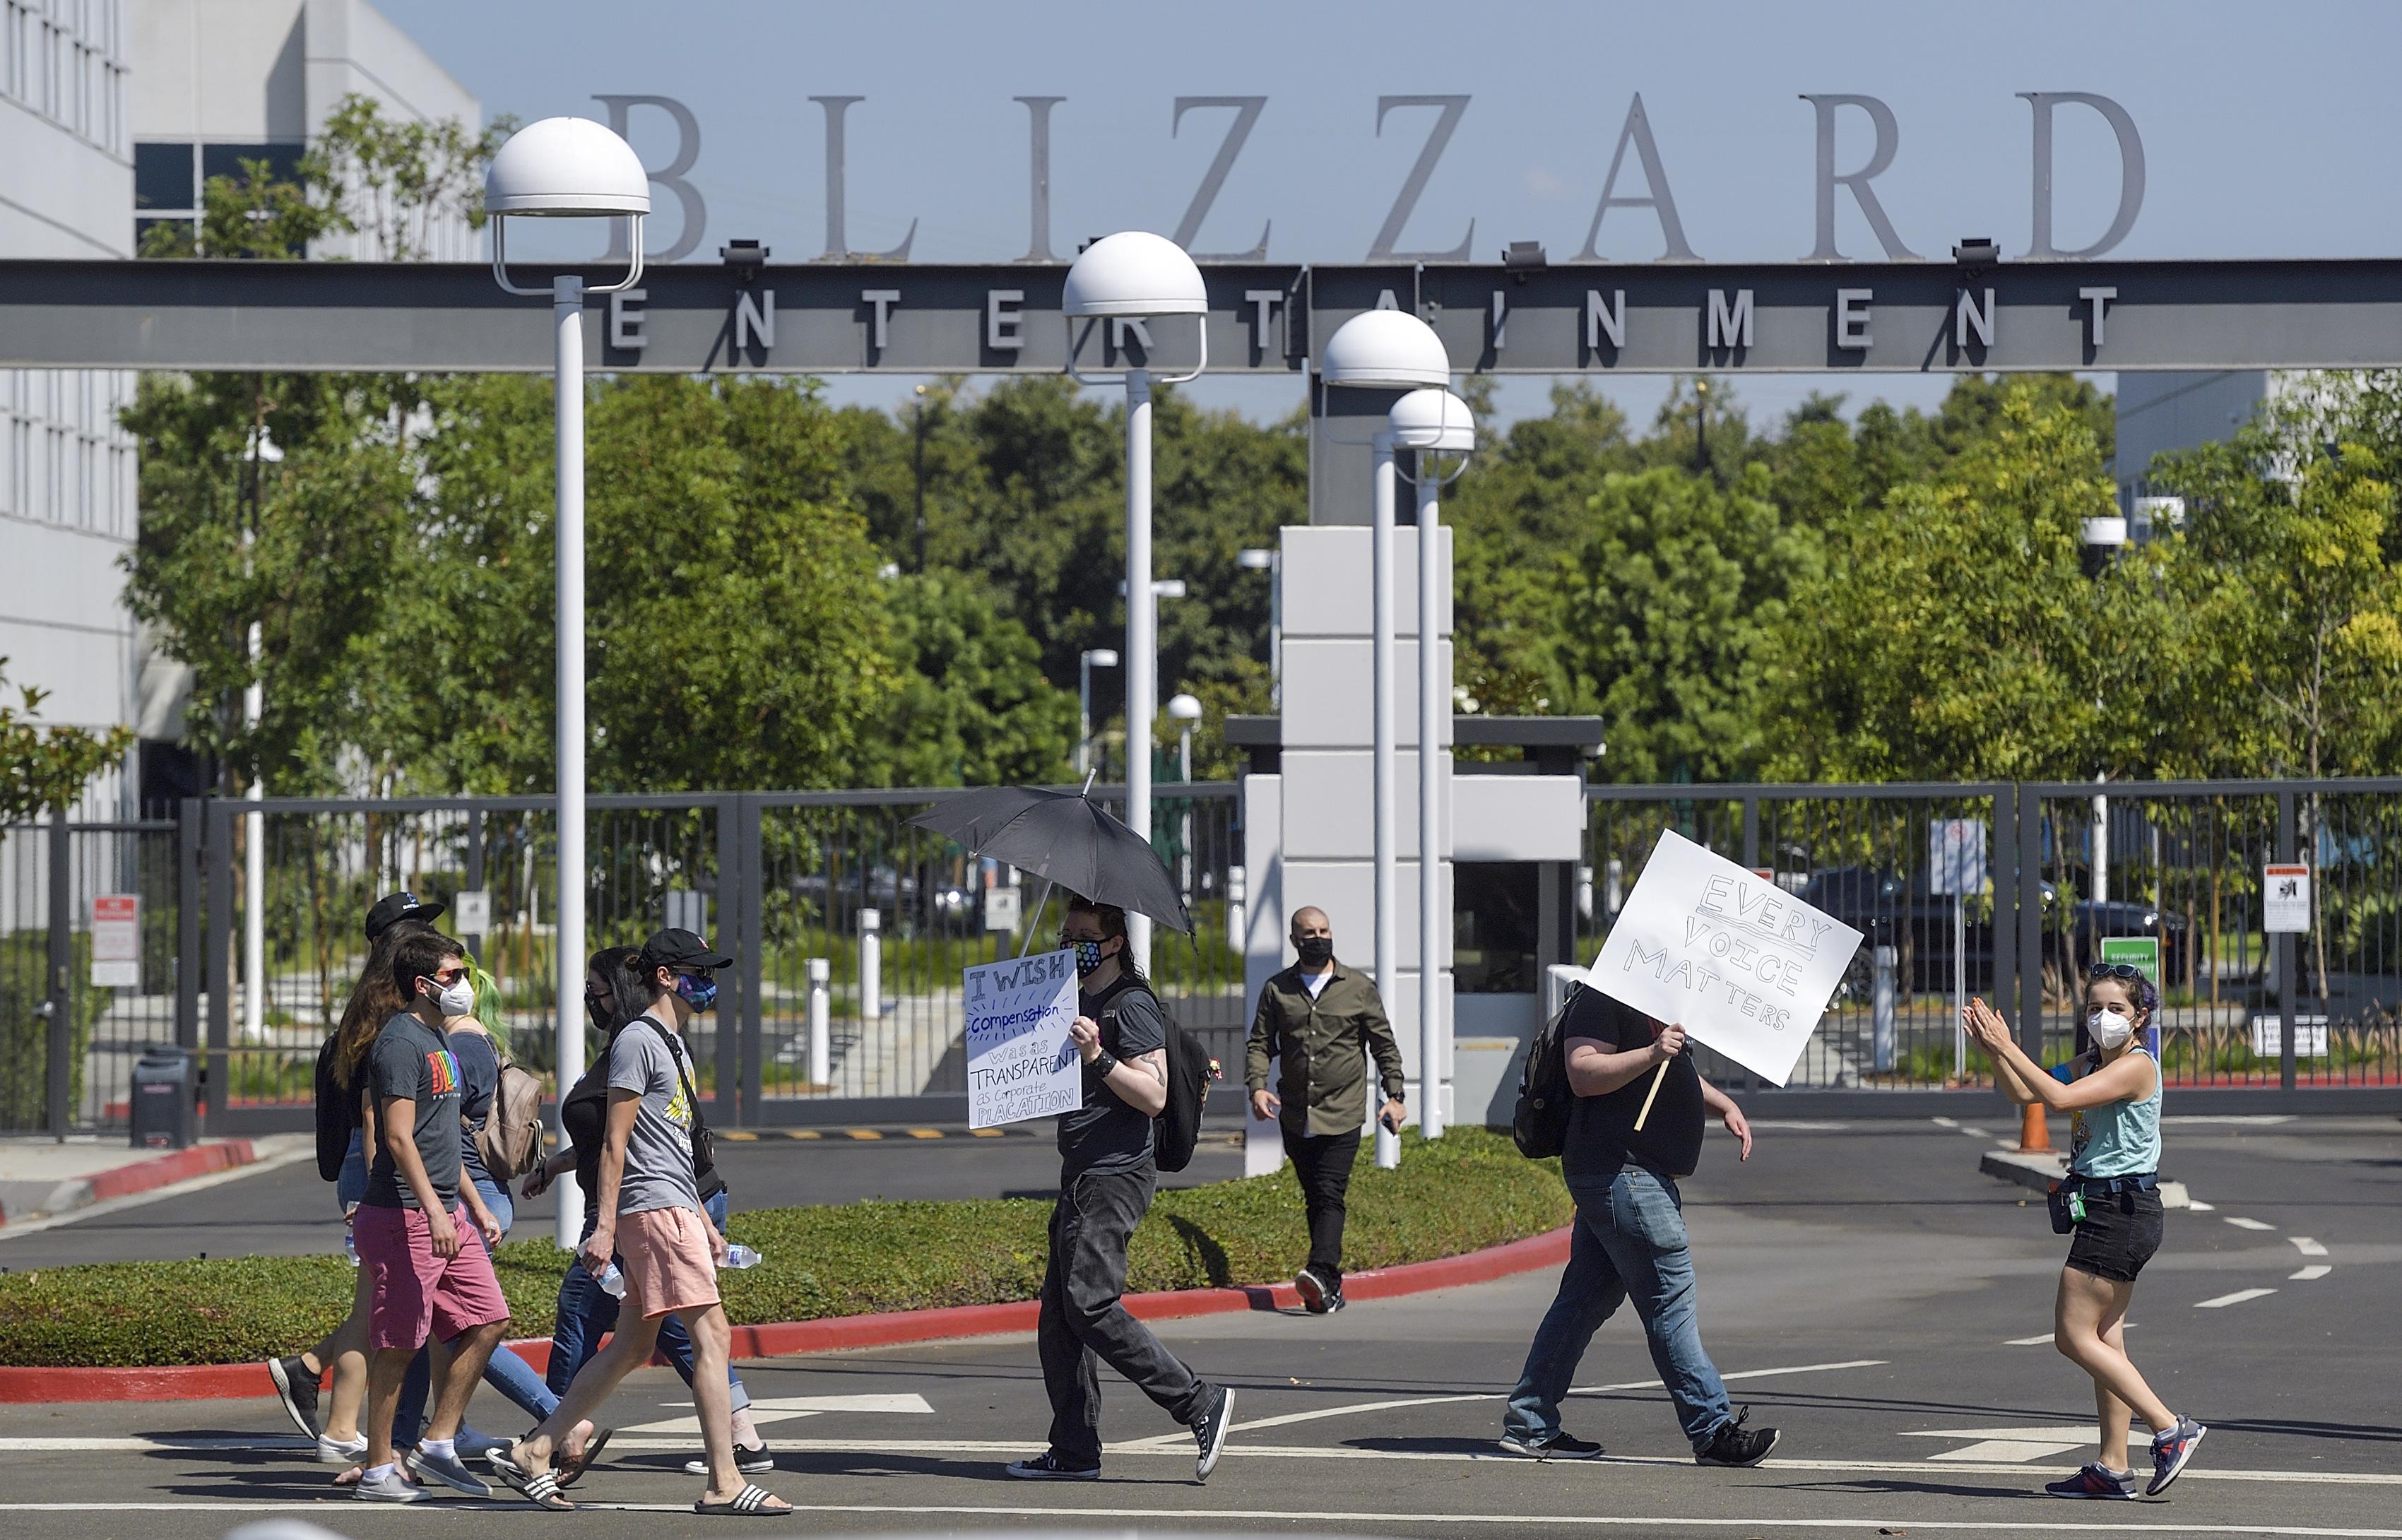 Blizzard Entertainment Employee Walkout